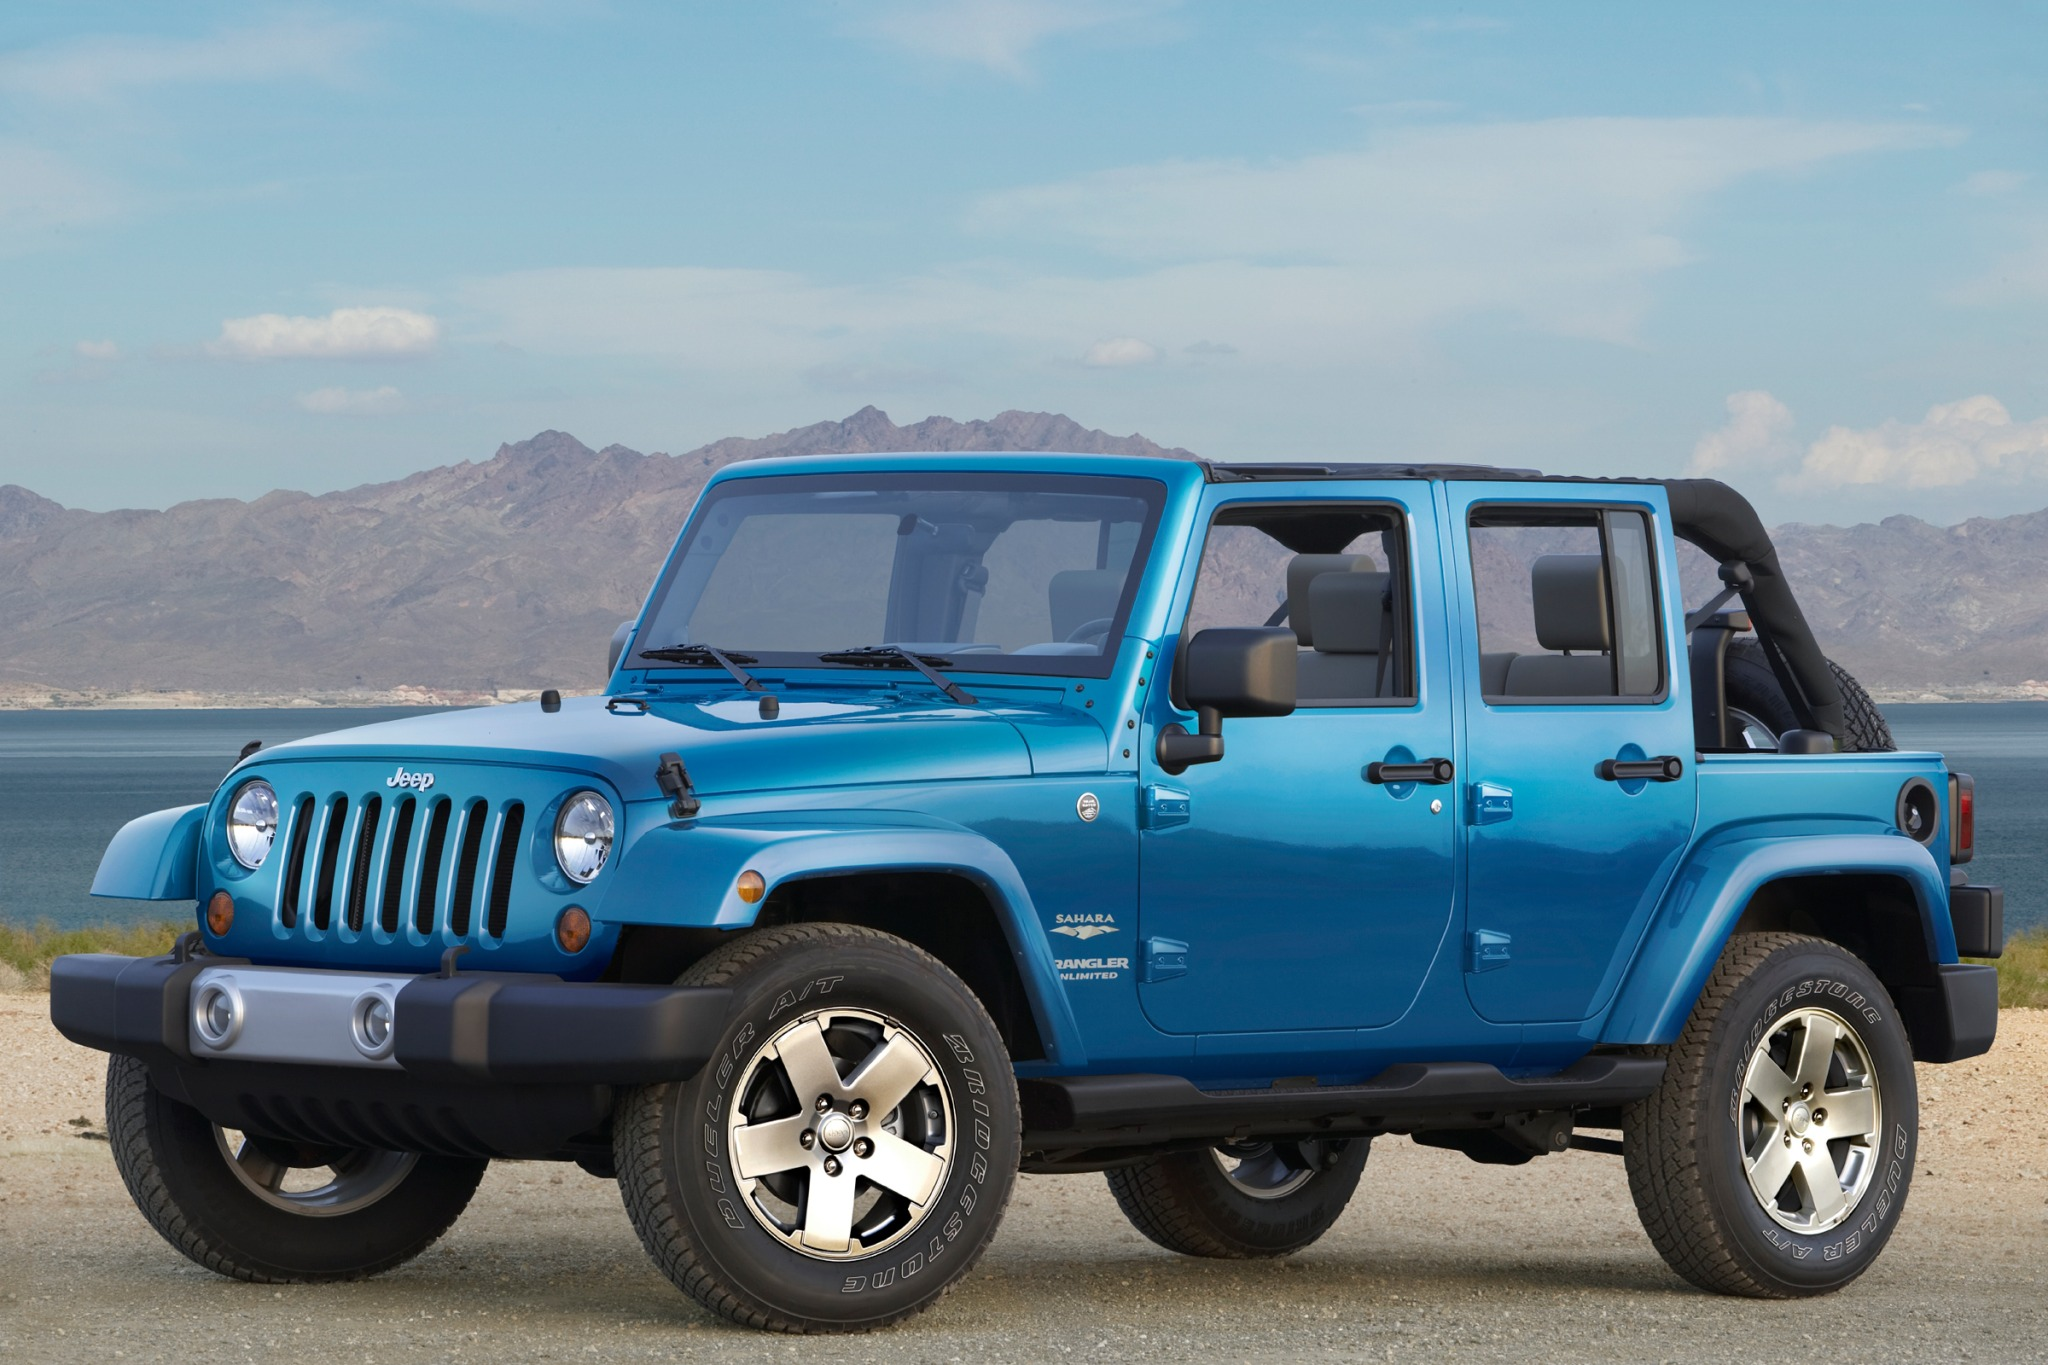 c wrangler for colorado used sale stock htm sport jeep near